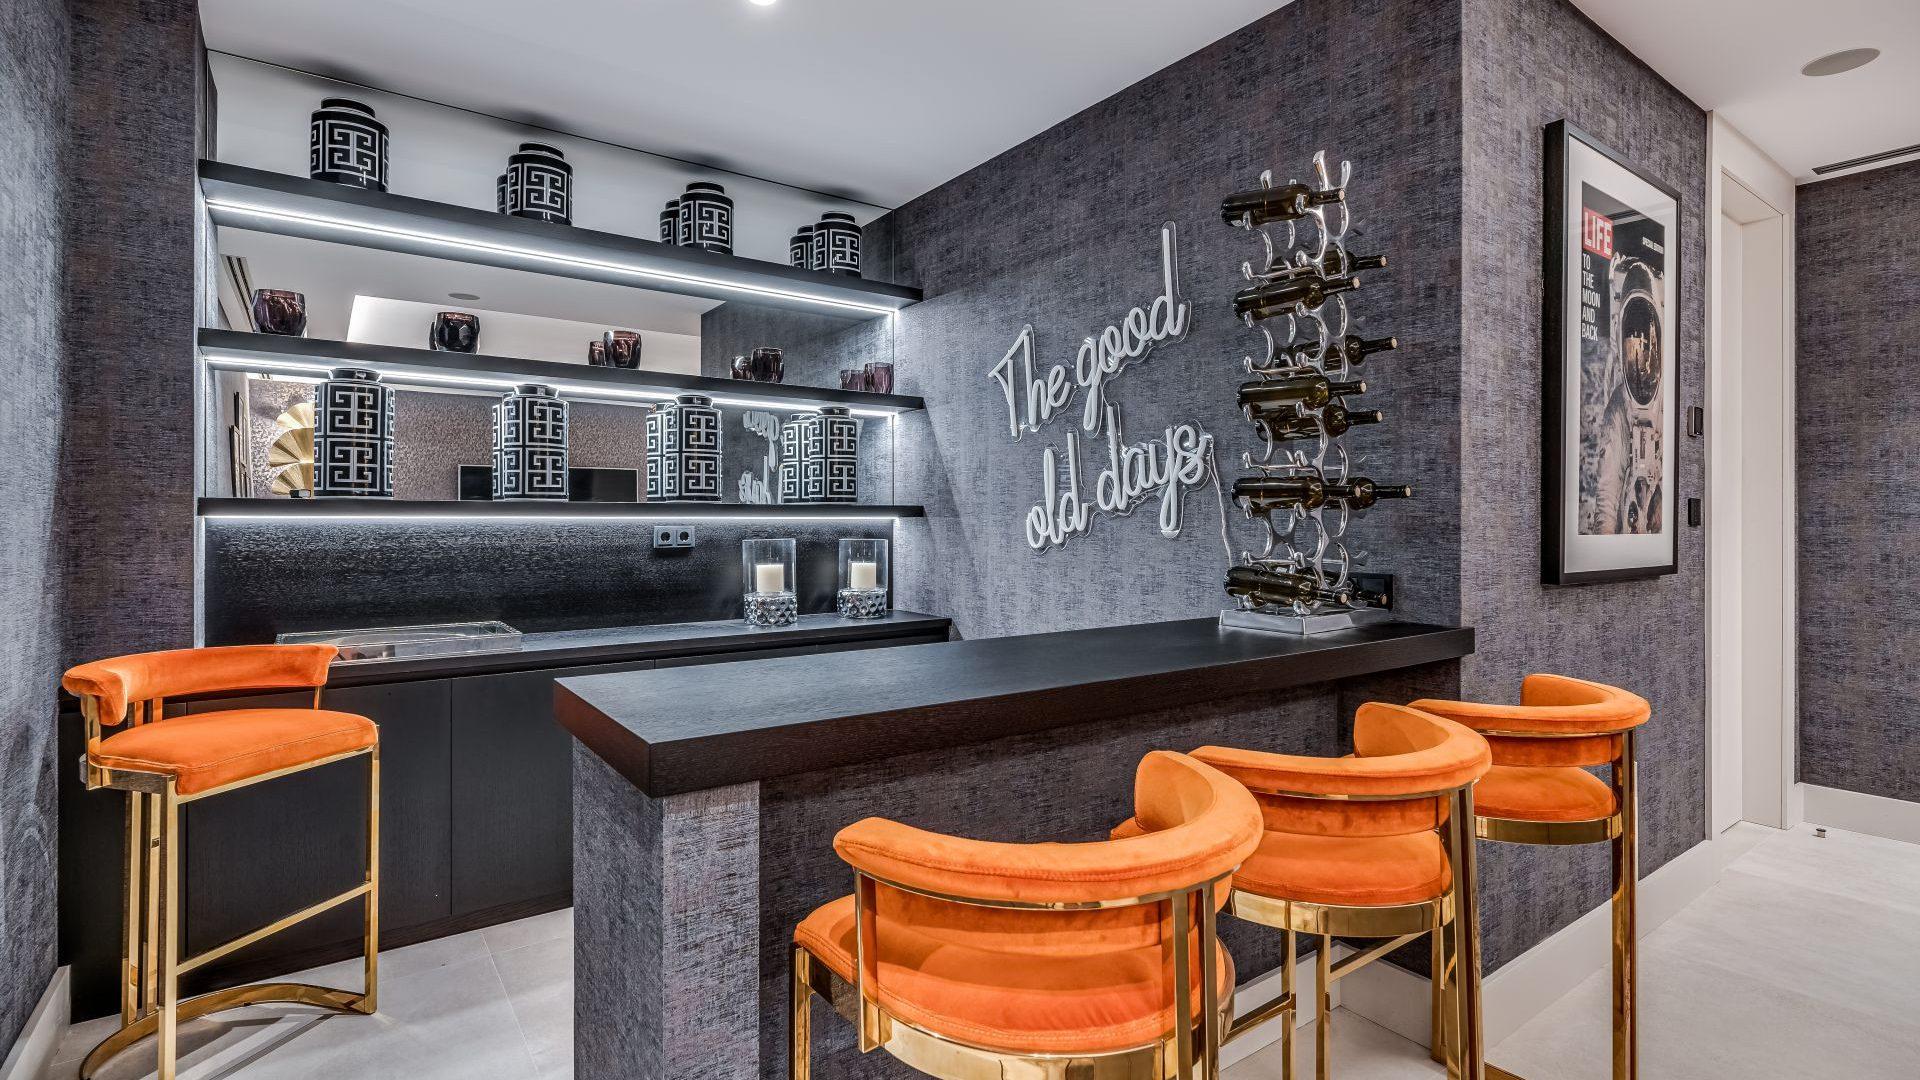 Bar area of this luxury villa in Marbella Golden Mile